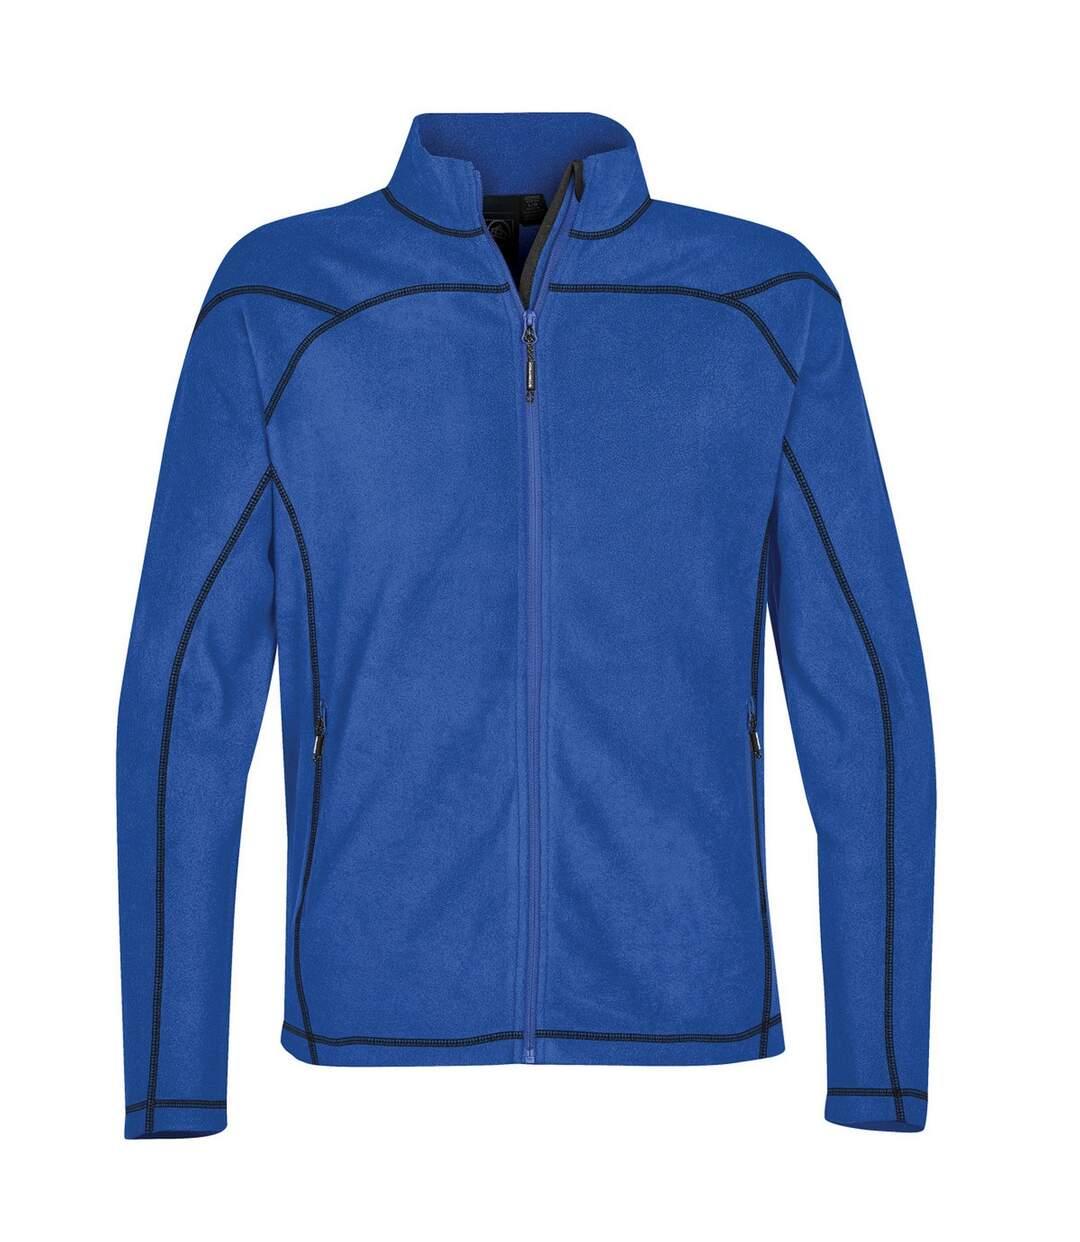 Stormtech Mens Reactor Fleece Shell Jacket (Black) - UTBC3889